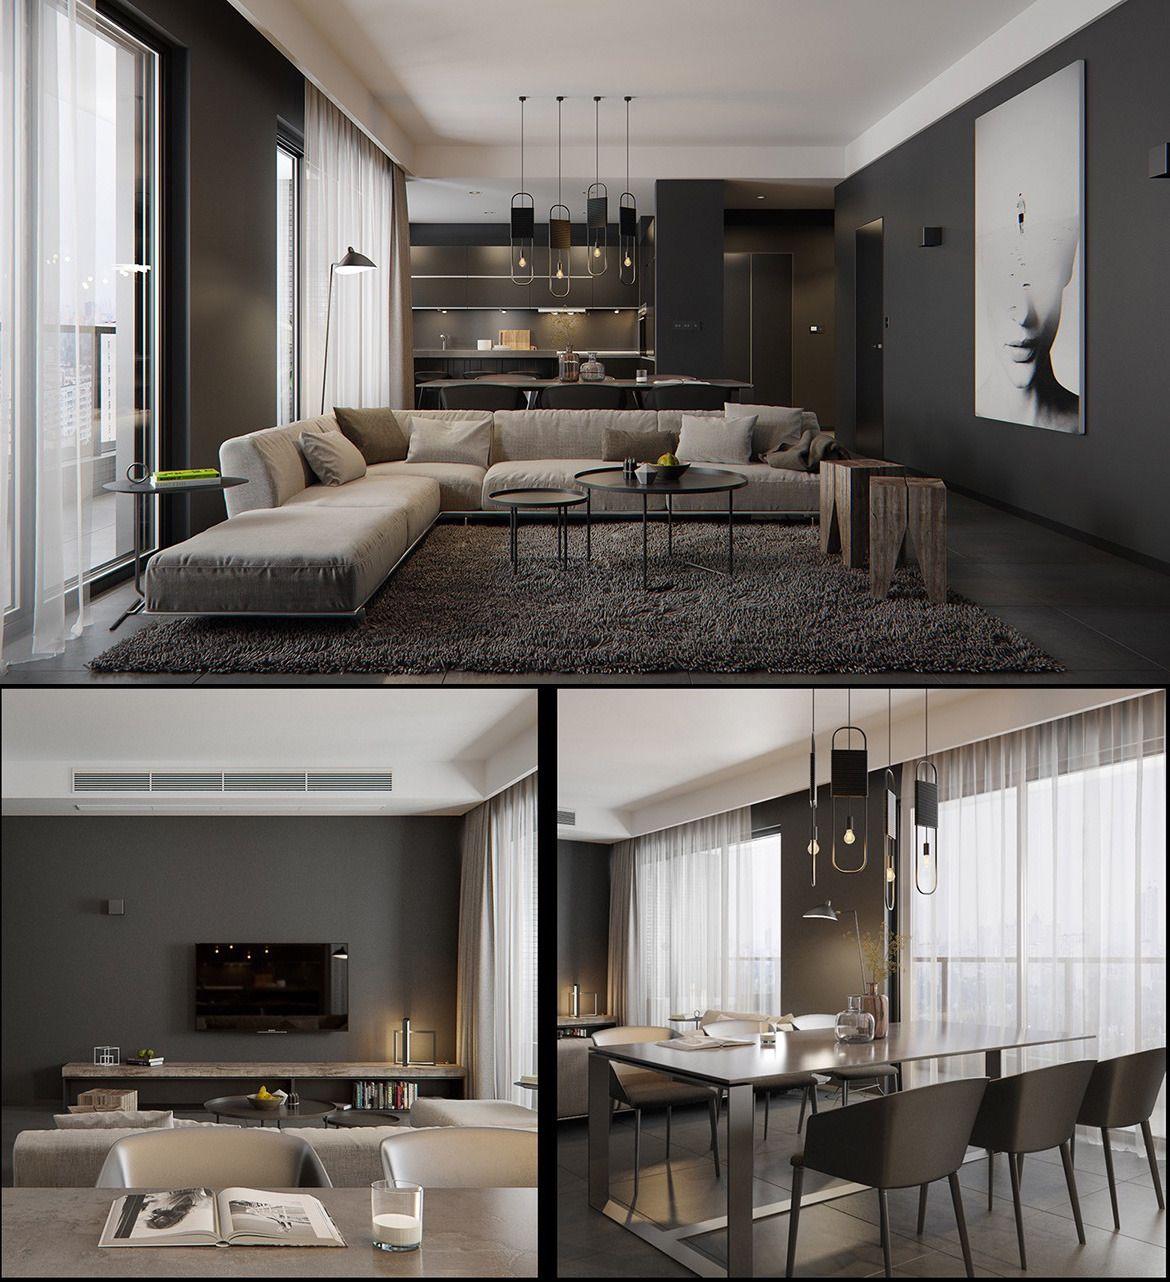 Best Home Designing — Via Luxury Styles 6 Dark And Daring 400 x 300